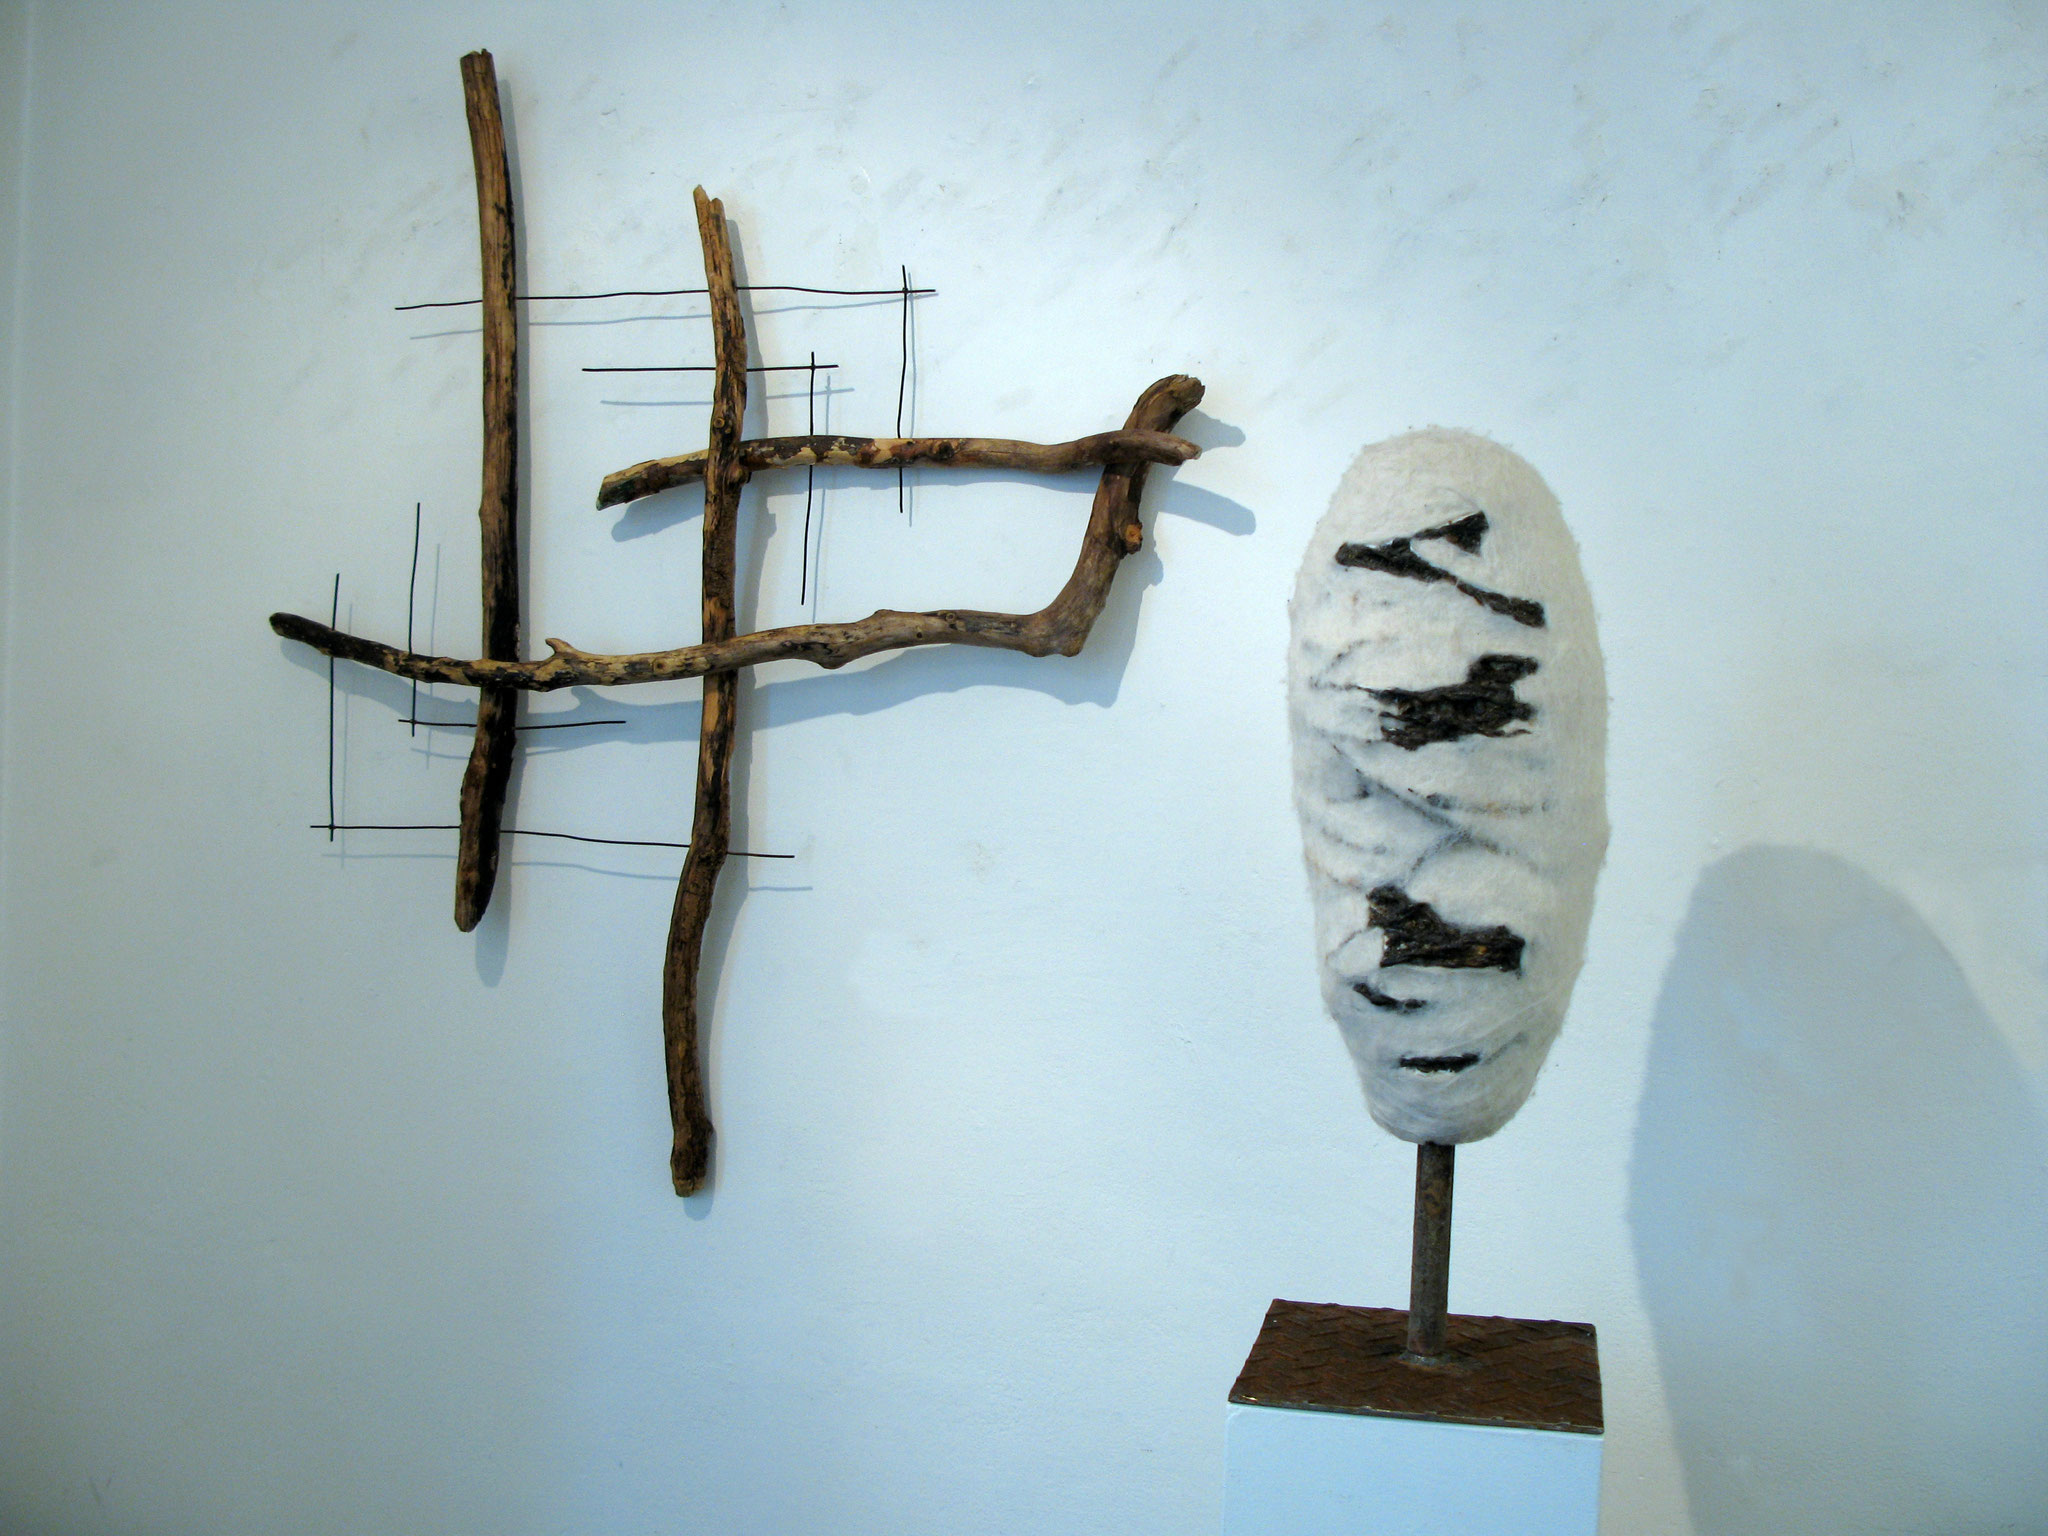 Fragment Nr.3 ausgerichtet, Kraftobjekte Wolfgang Wallner Hall in Tirol